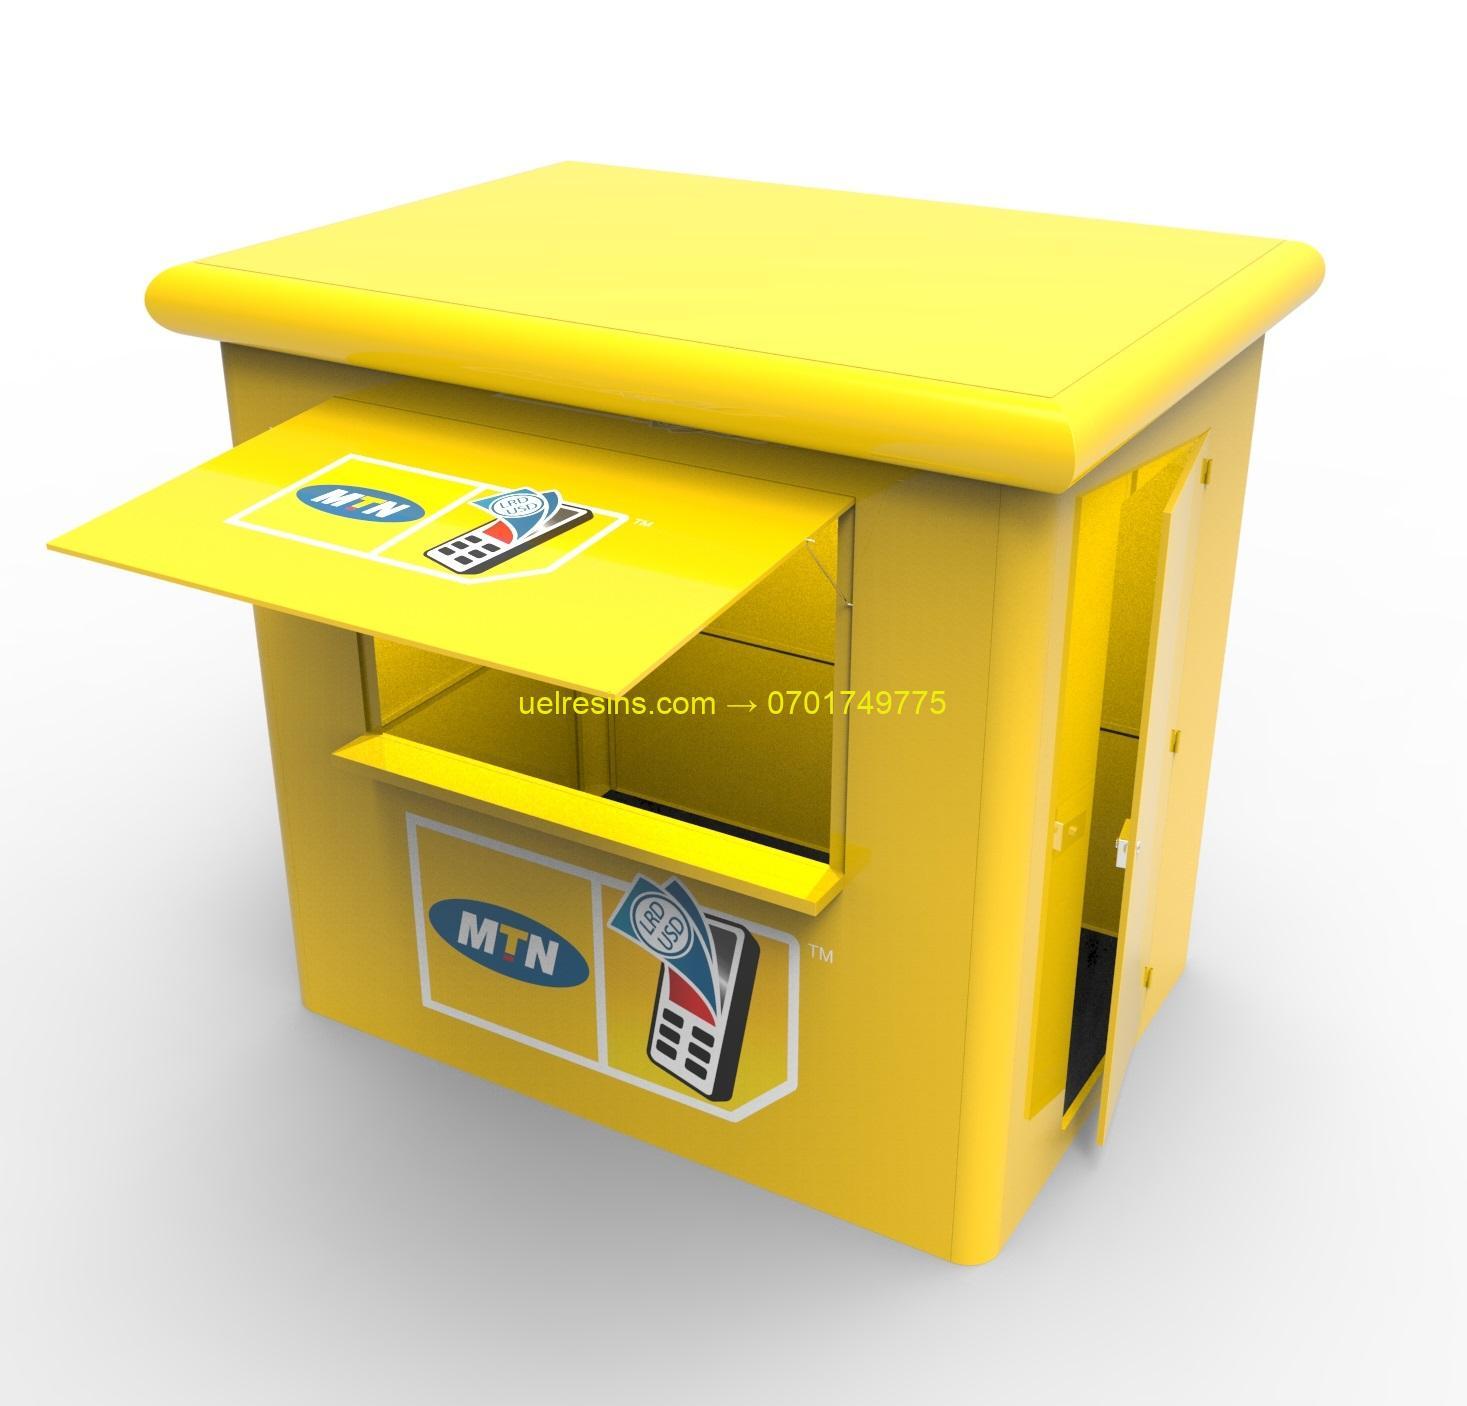 Fibreglass Kiosk Design and Manufacture in Rwanda